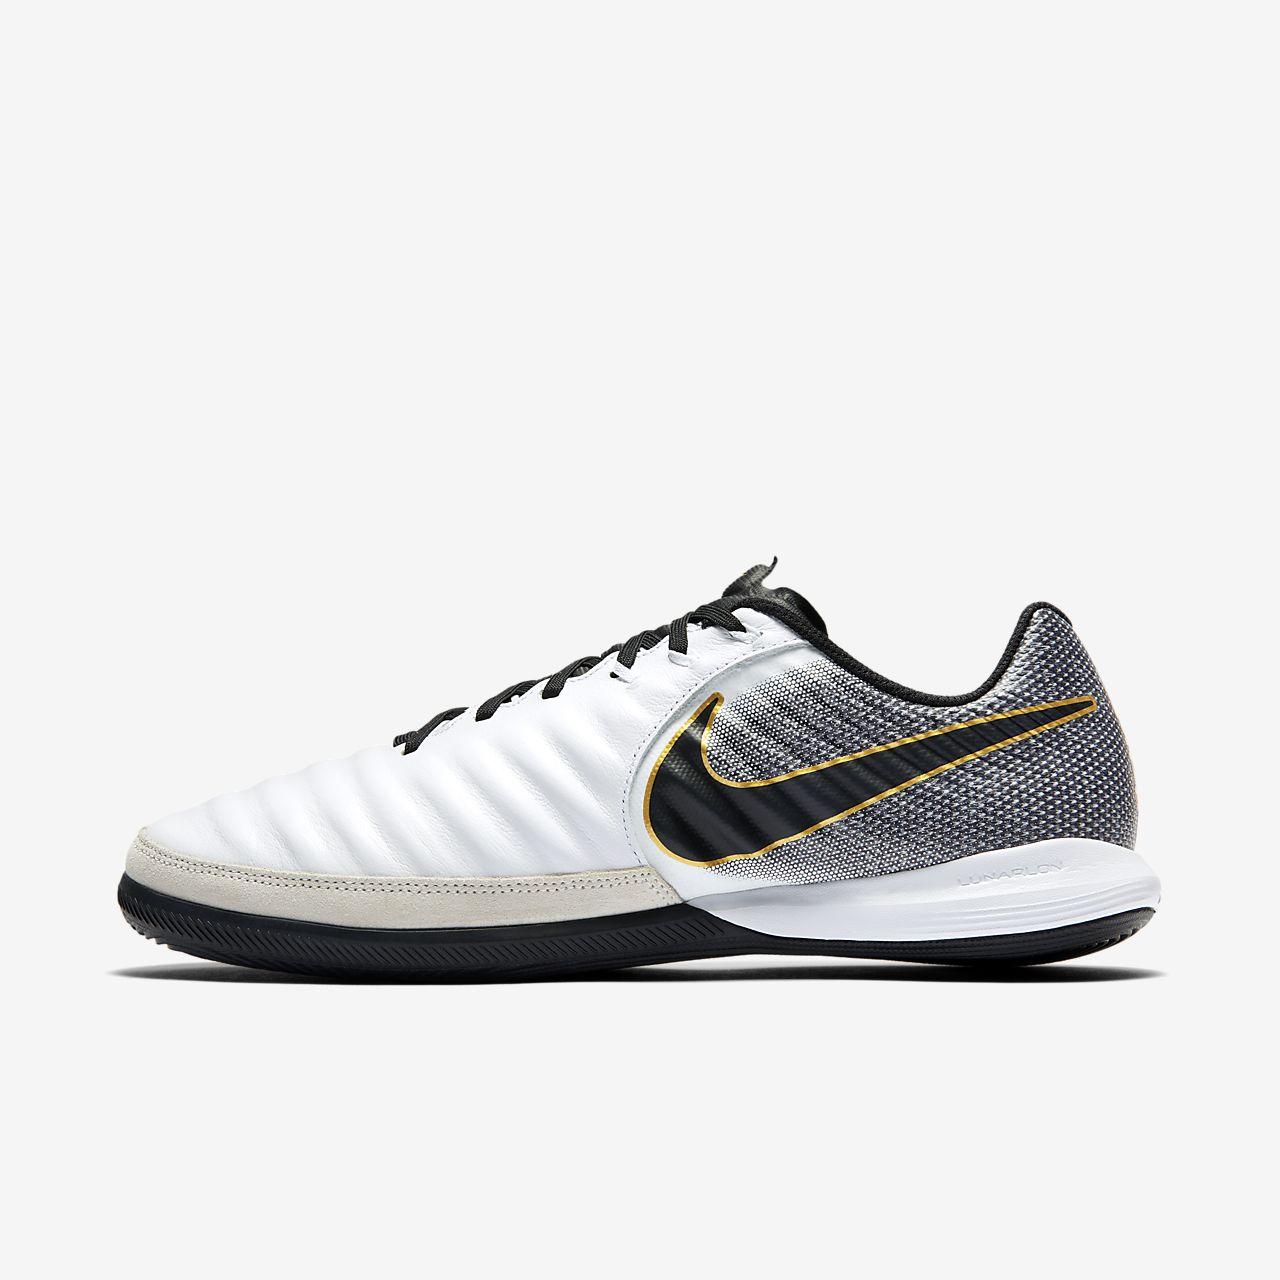 brand new a4d25 3a945 ... Nike TiempoX Lunar Legend VII Pro Botas de fútbol sala